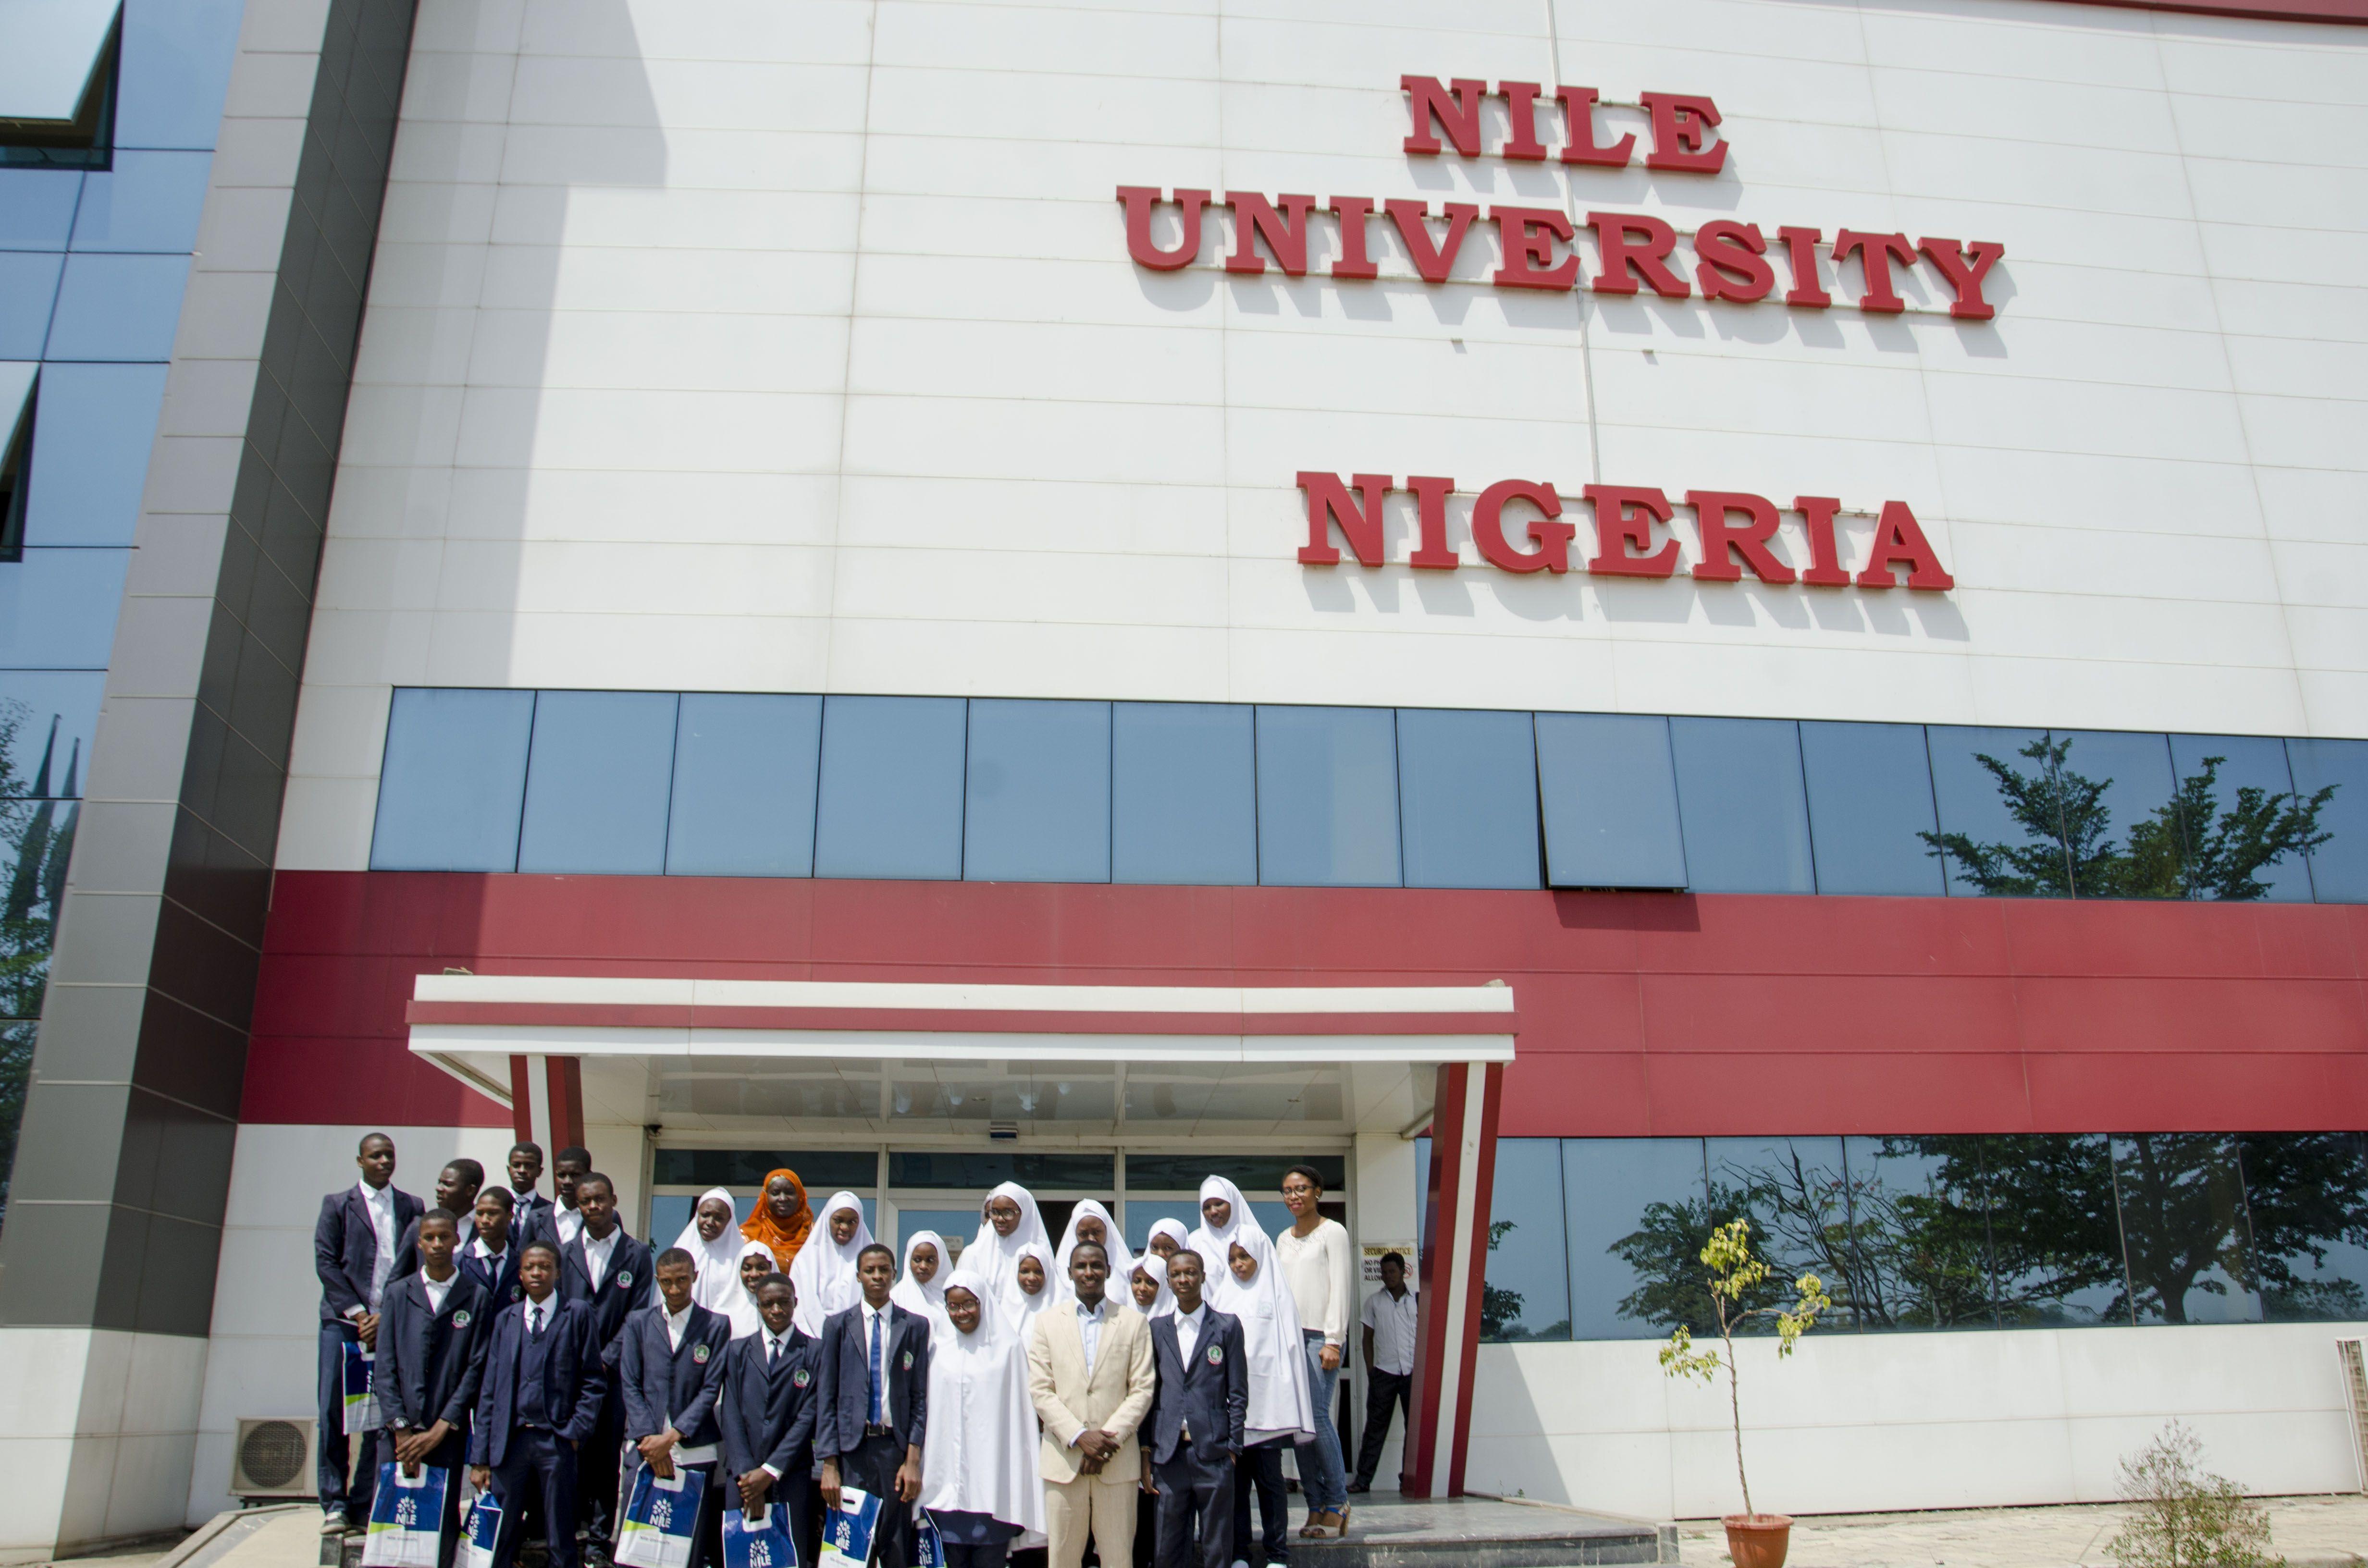 Fouad Lababidi Islamic Academy from Wuse Zone 3, Abuja paid a visit